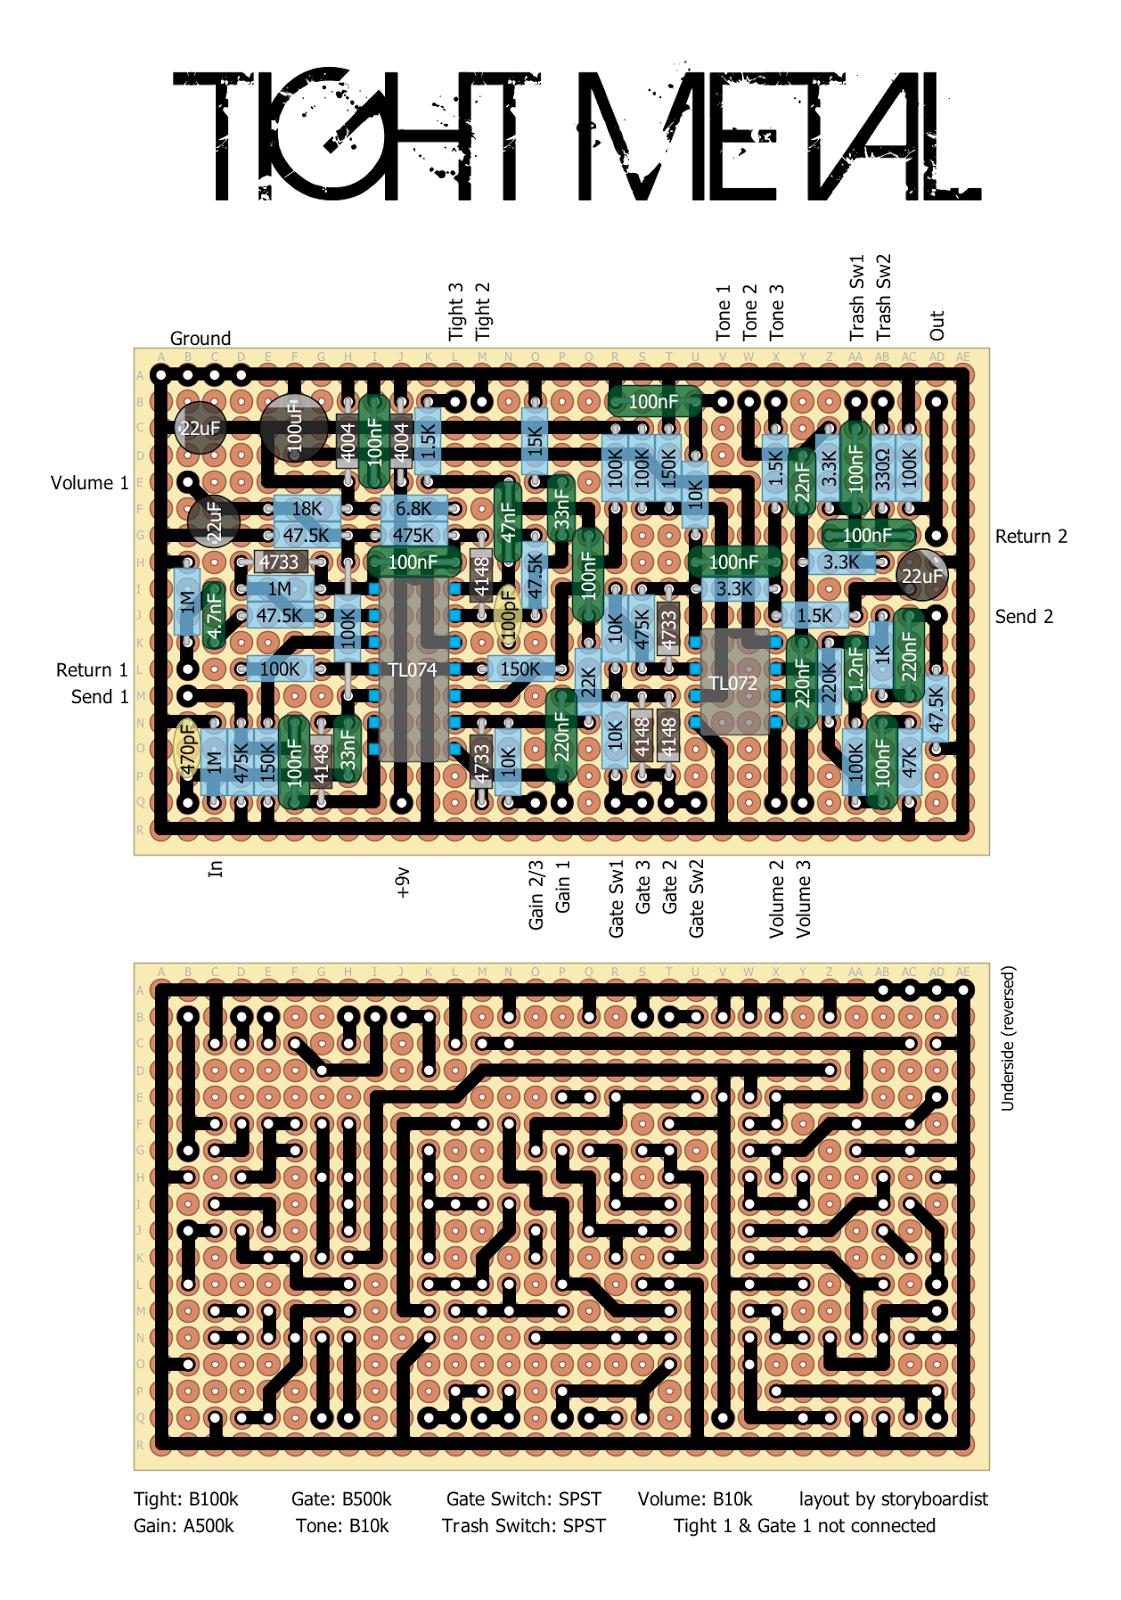 vga to rca converter wiring diagram images joystick usb wiring diagram also dvi to vga pinout [ 1121 x 1600 Pixel ]